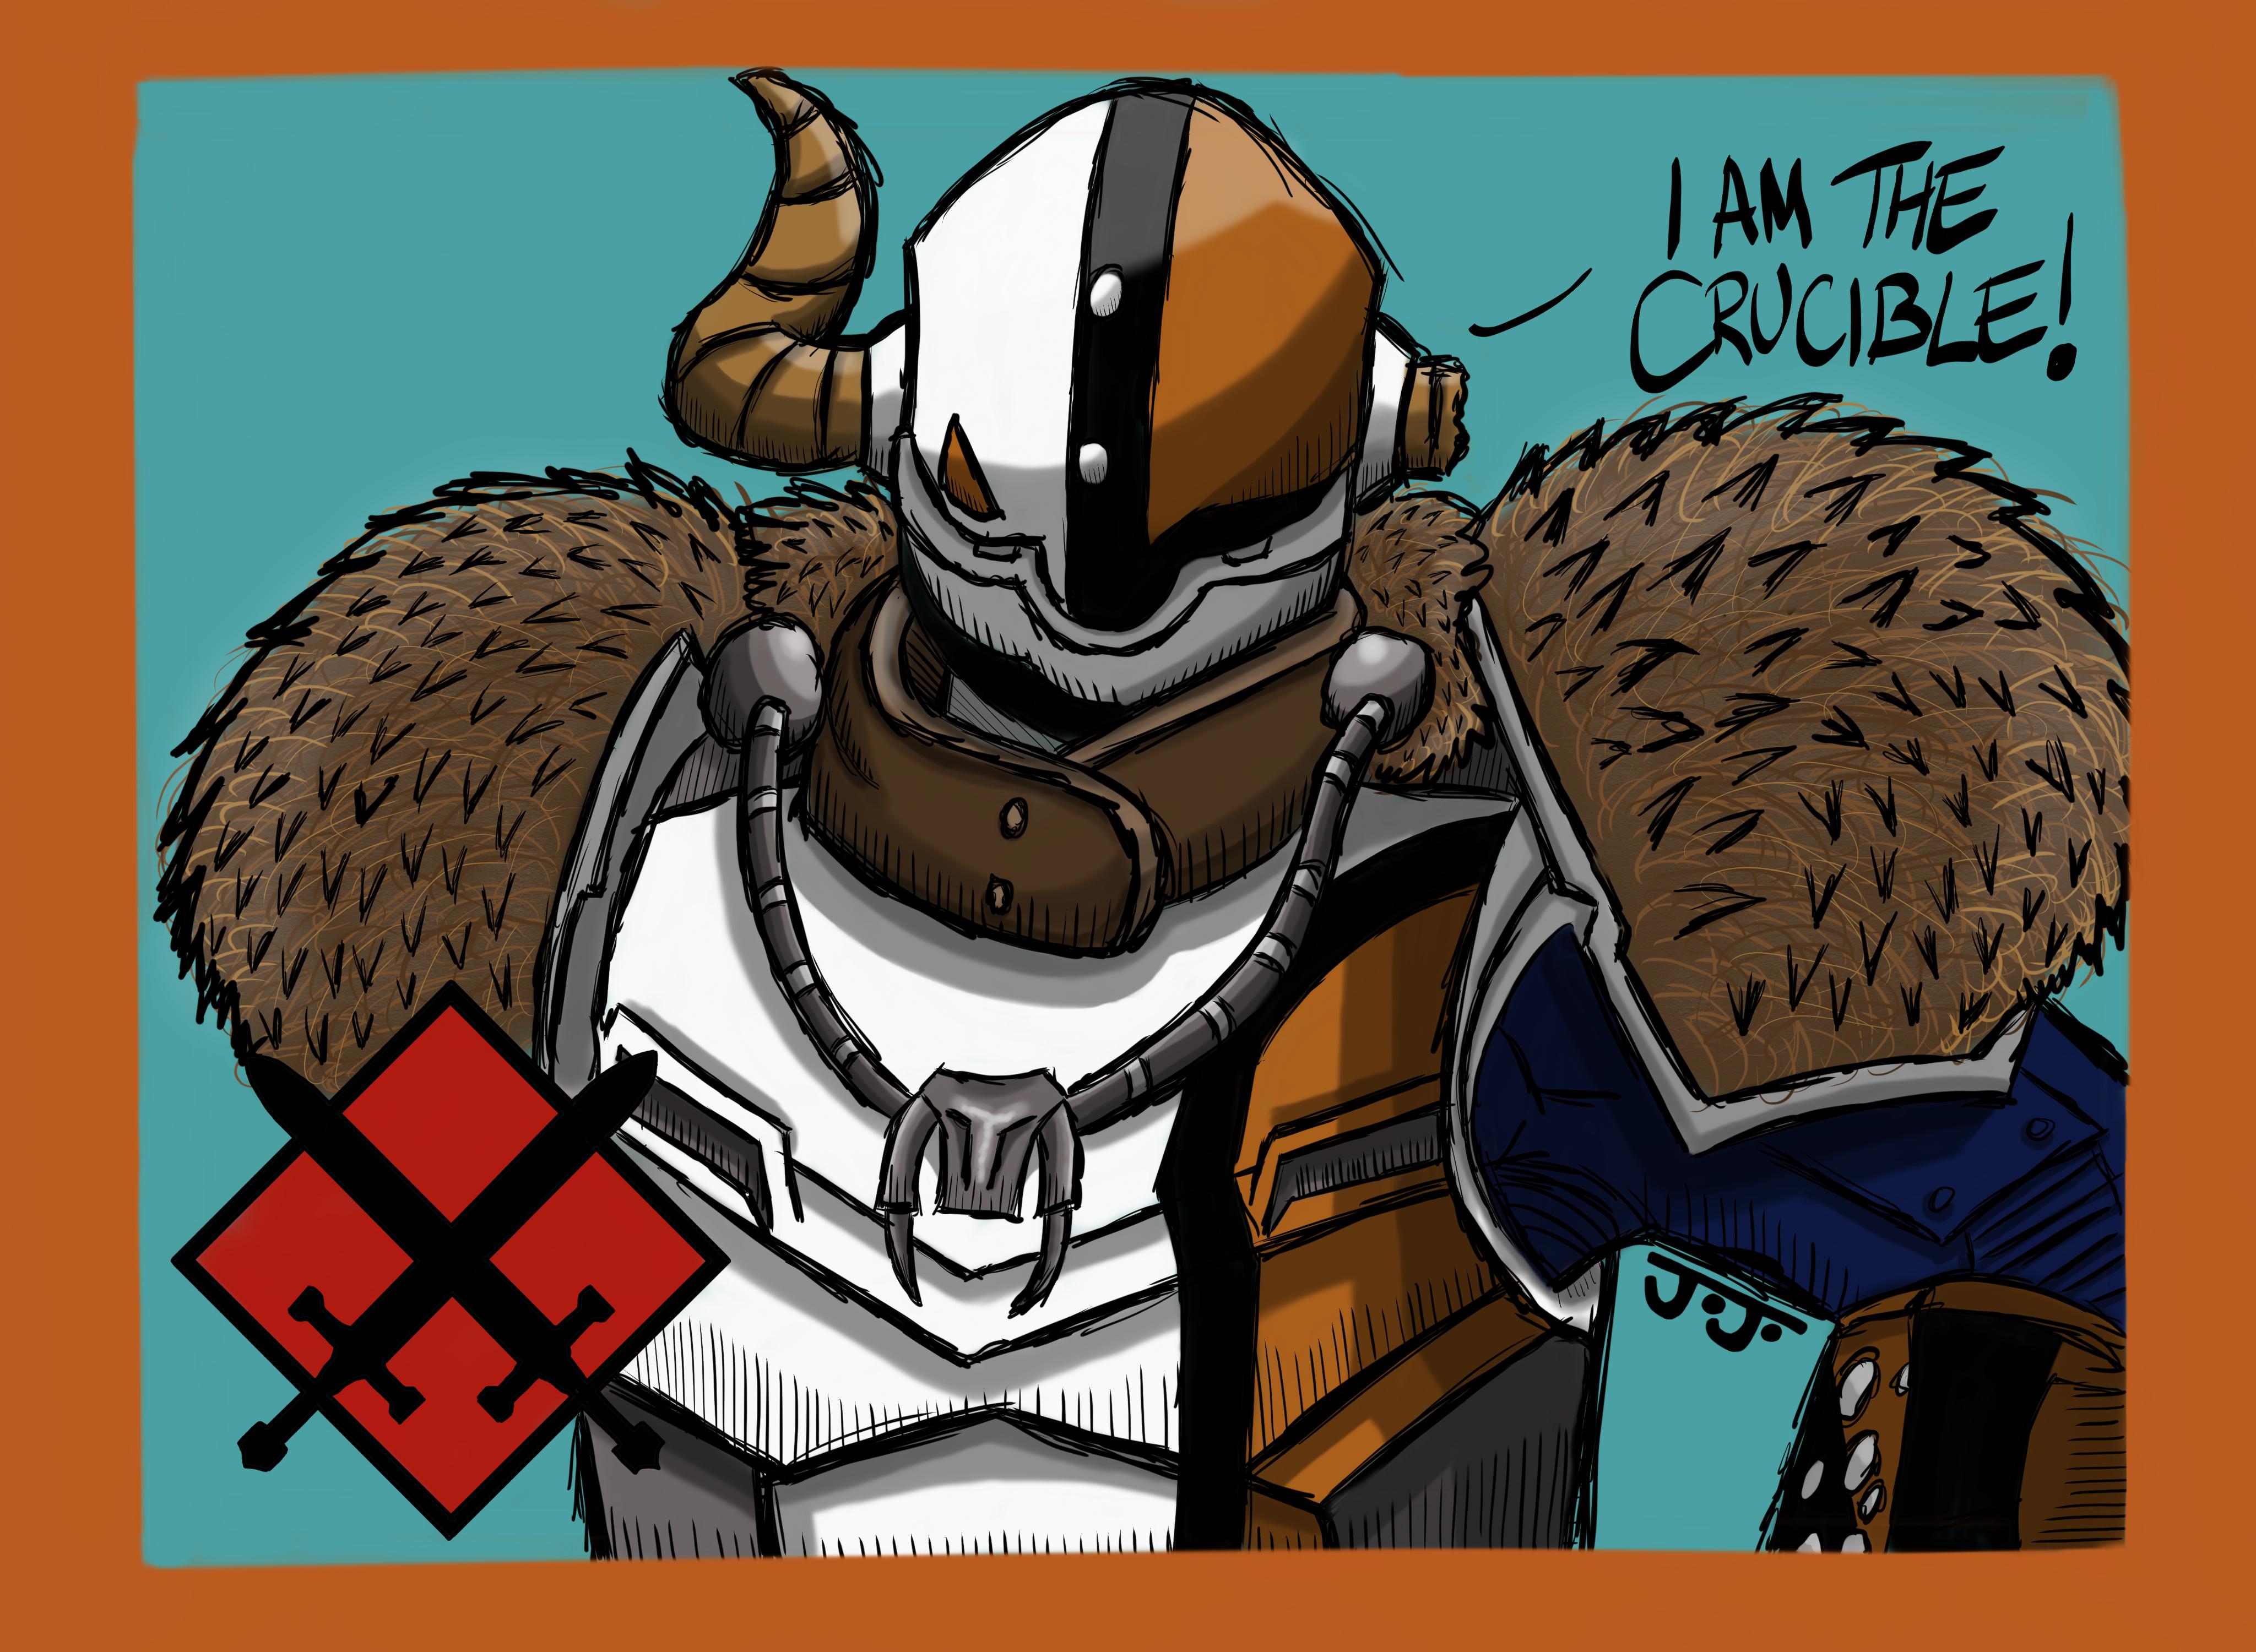 I am the crucible!